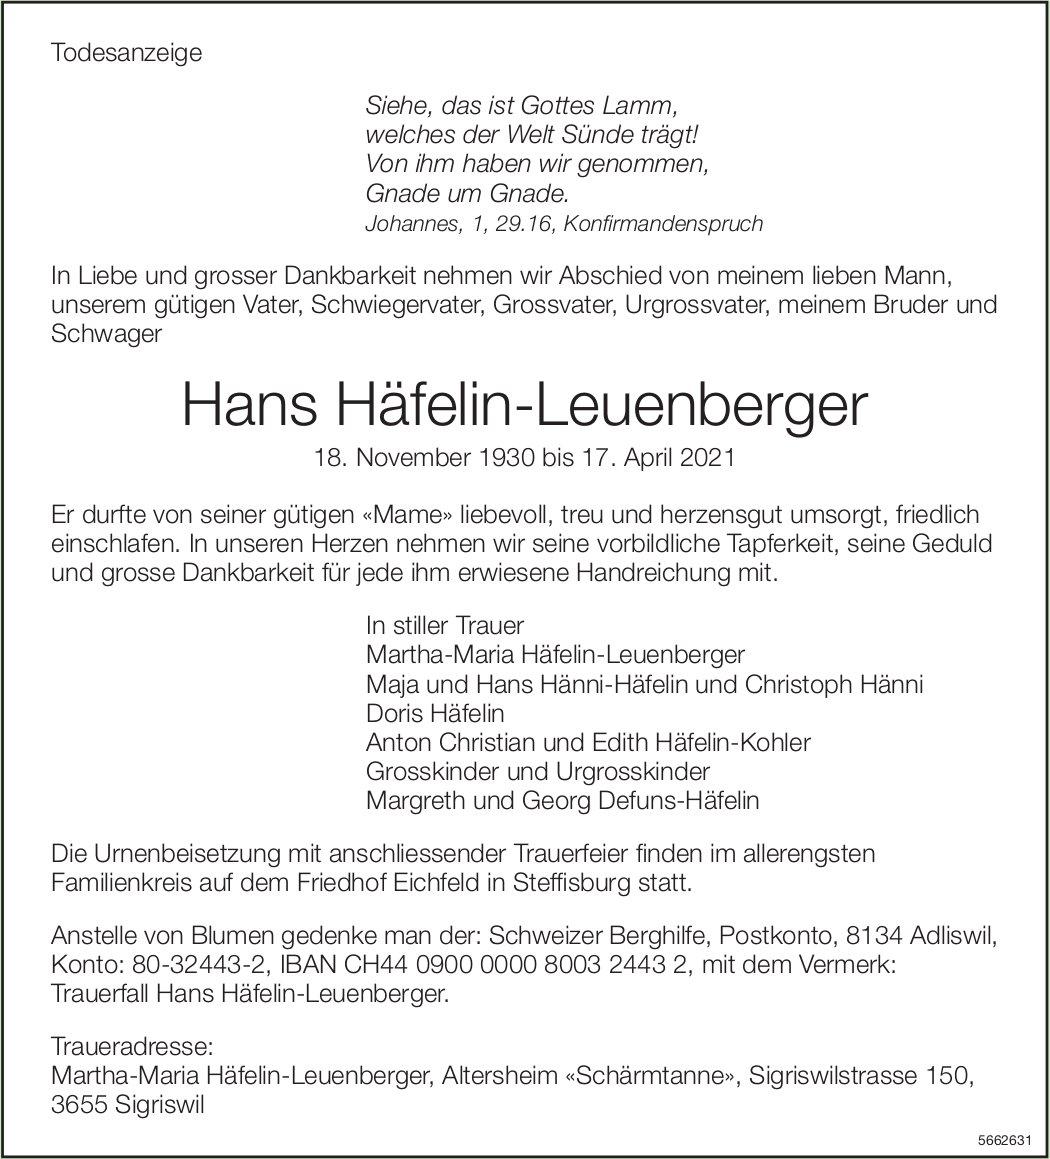 Häfelin-Leuenberger Hans, April 2021 / TA